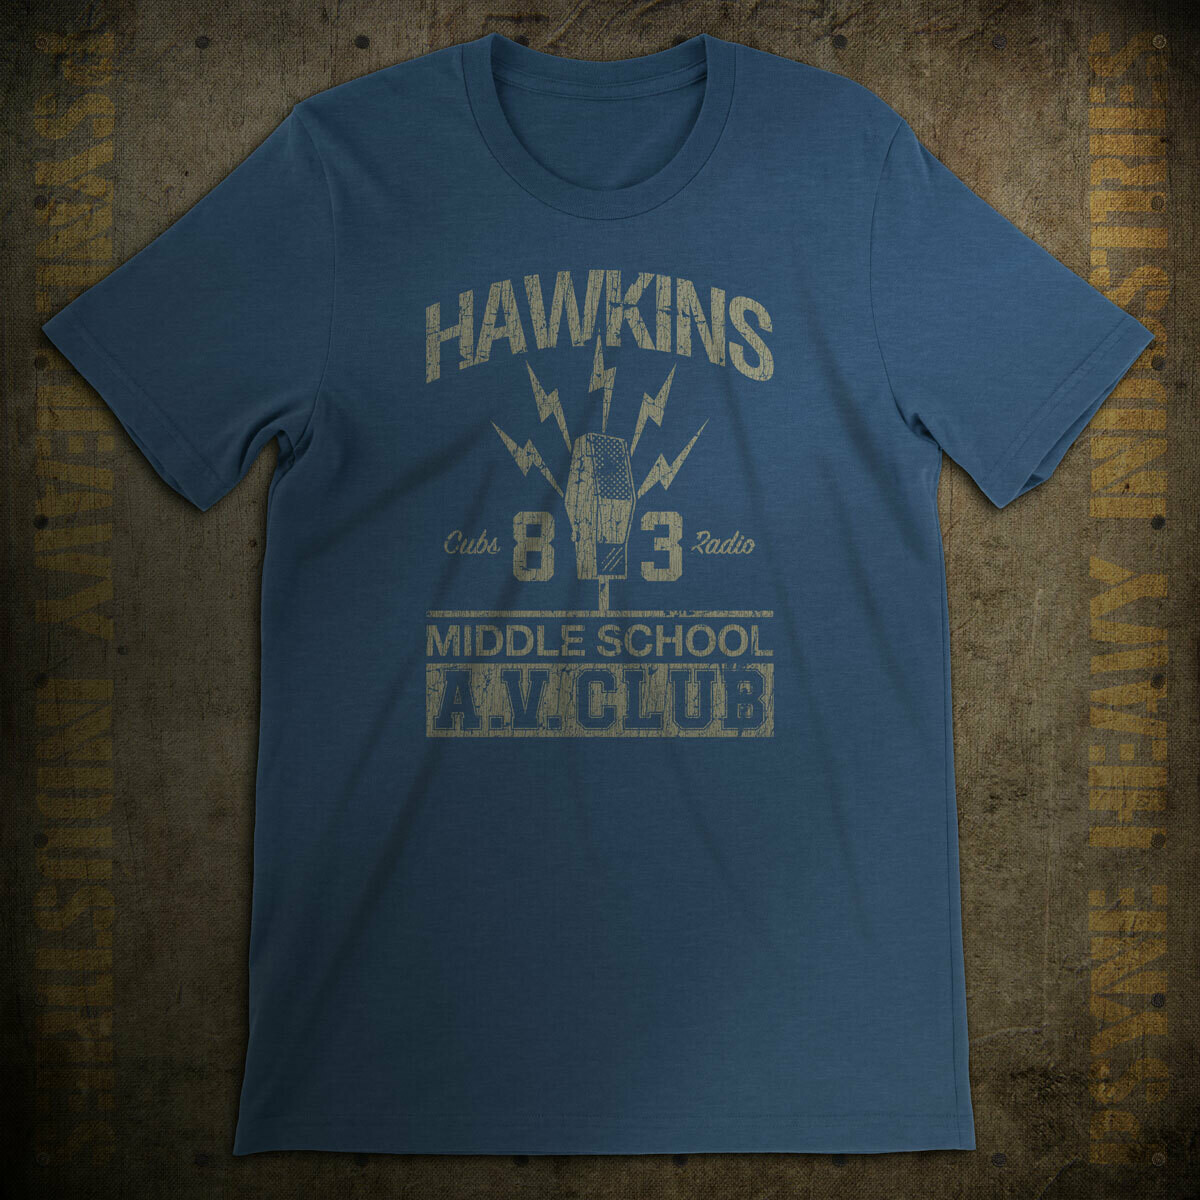 Hawkins Middle School AV Club Vintage T-Shirt